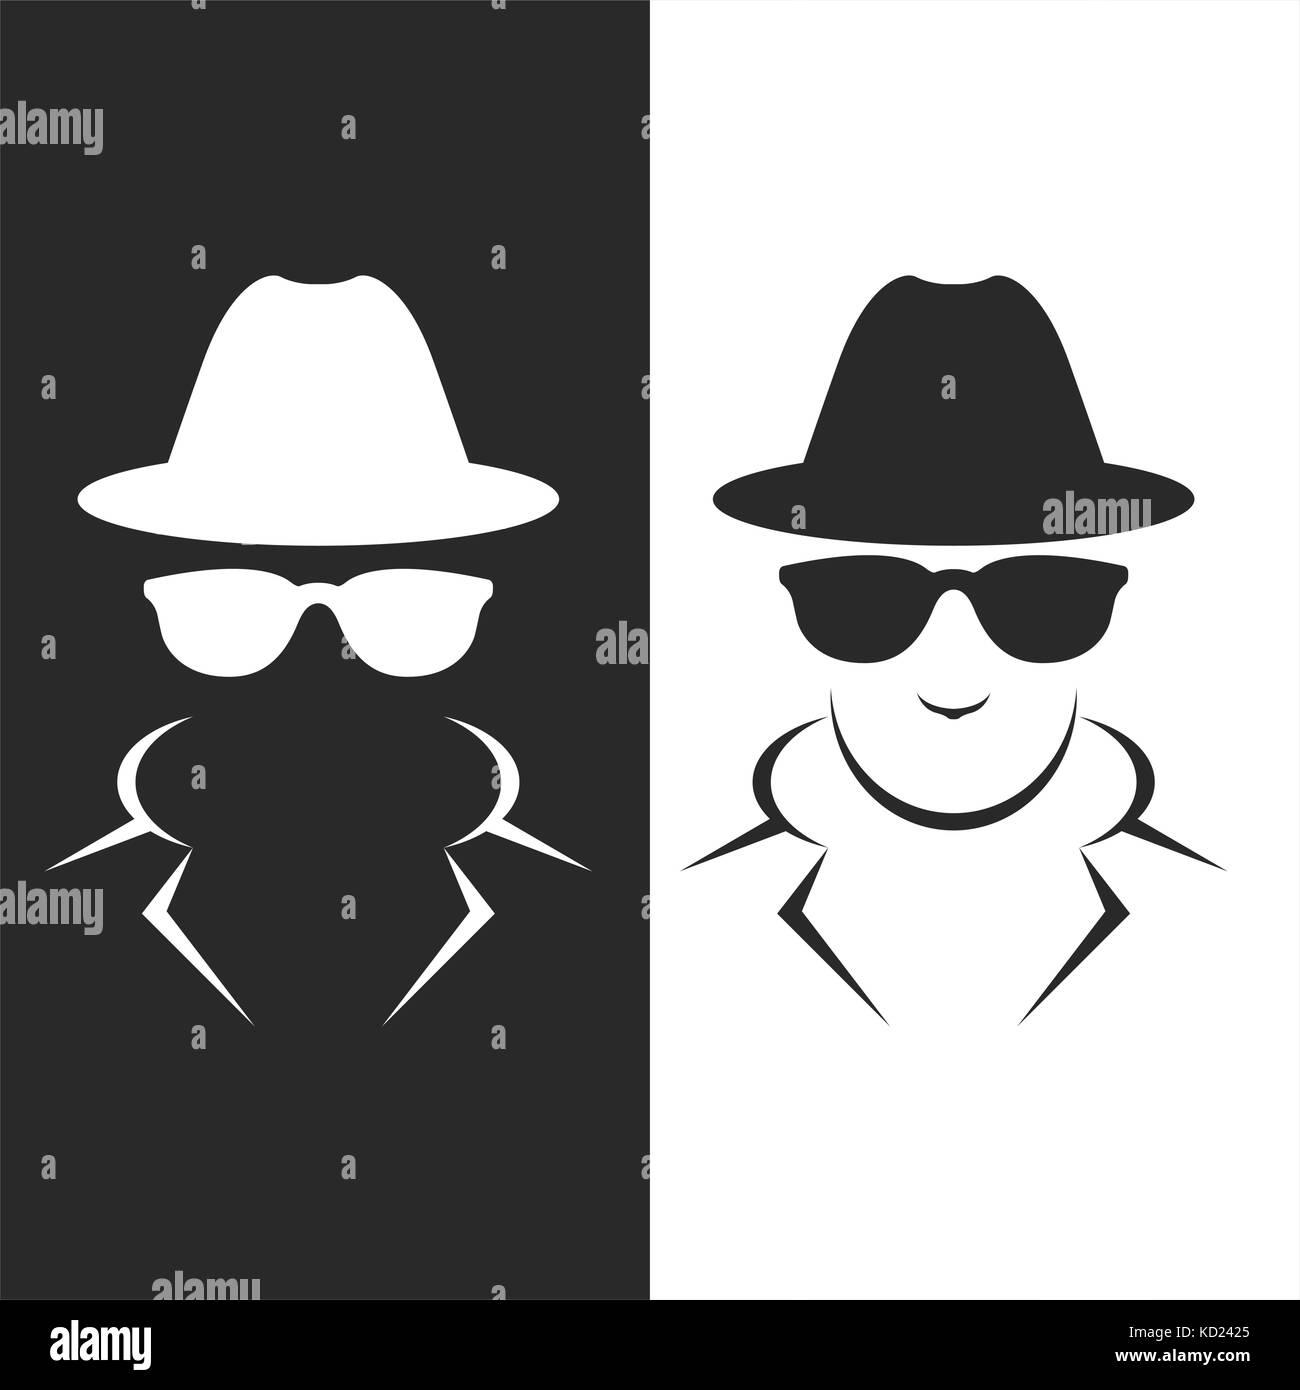 Undercover agent or spy - private detective icon - Stock Vector